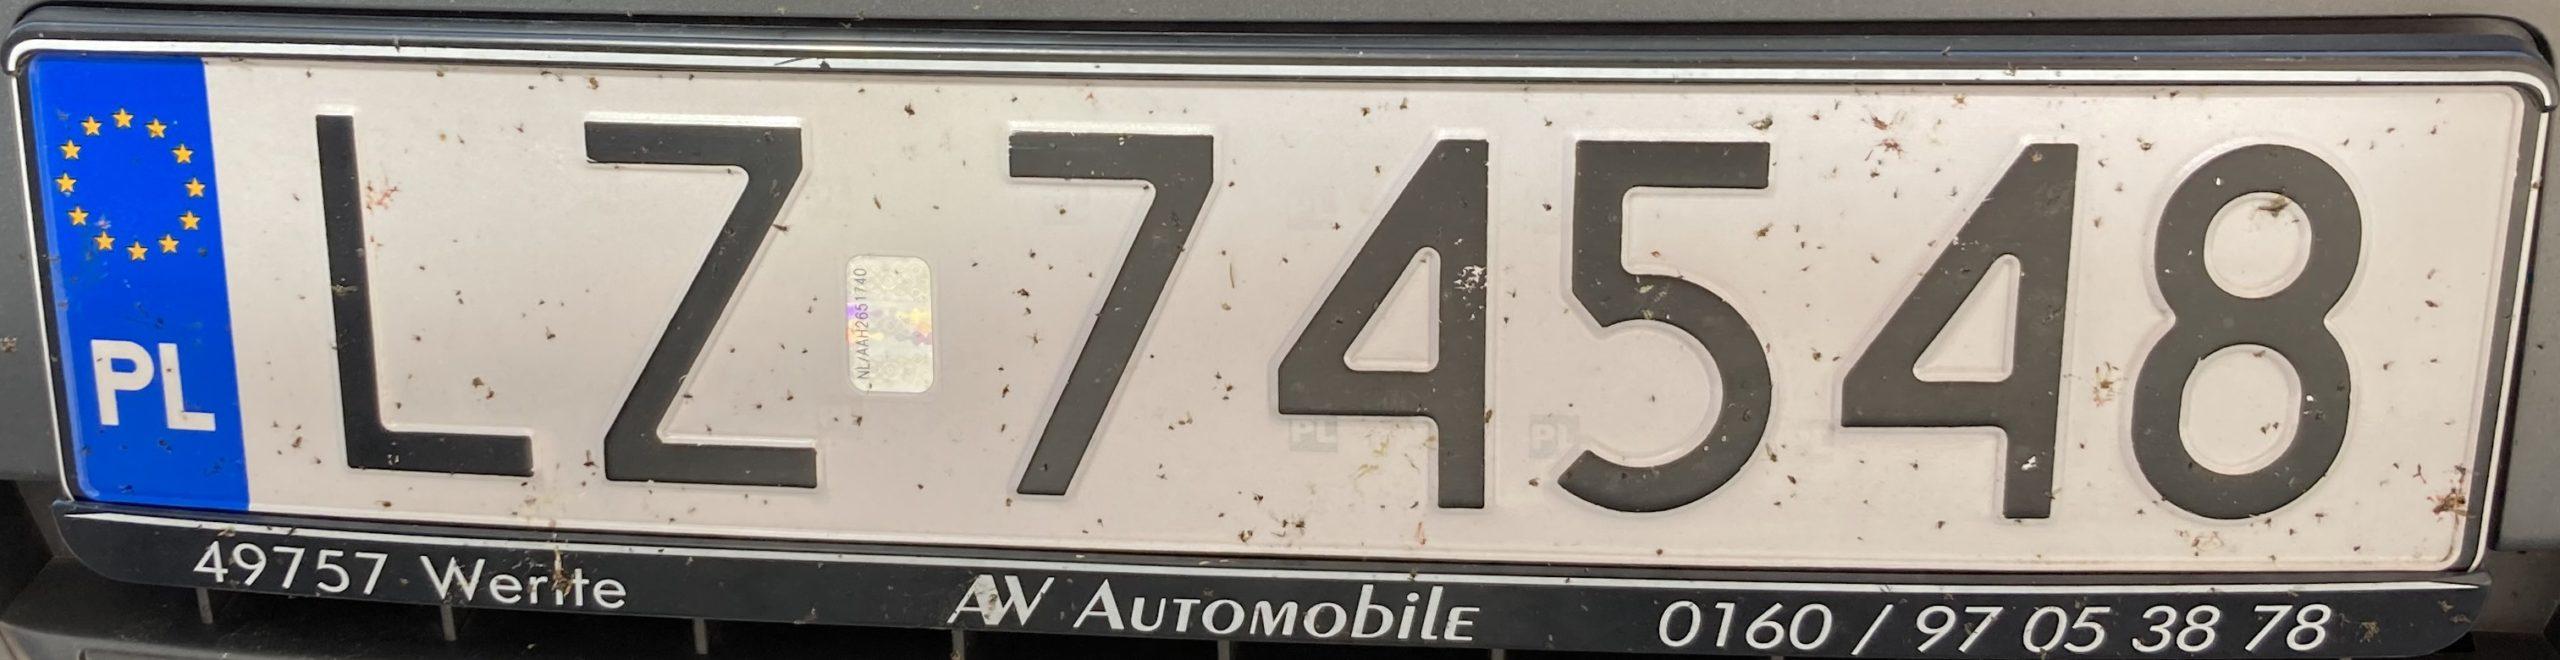 Registrační značka Polsko – LZ – Zamośc, foto: www.podalnici.cz